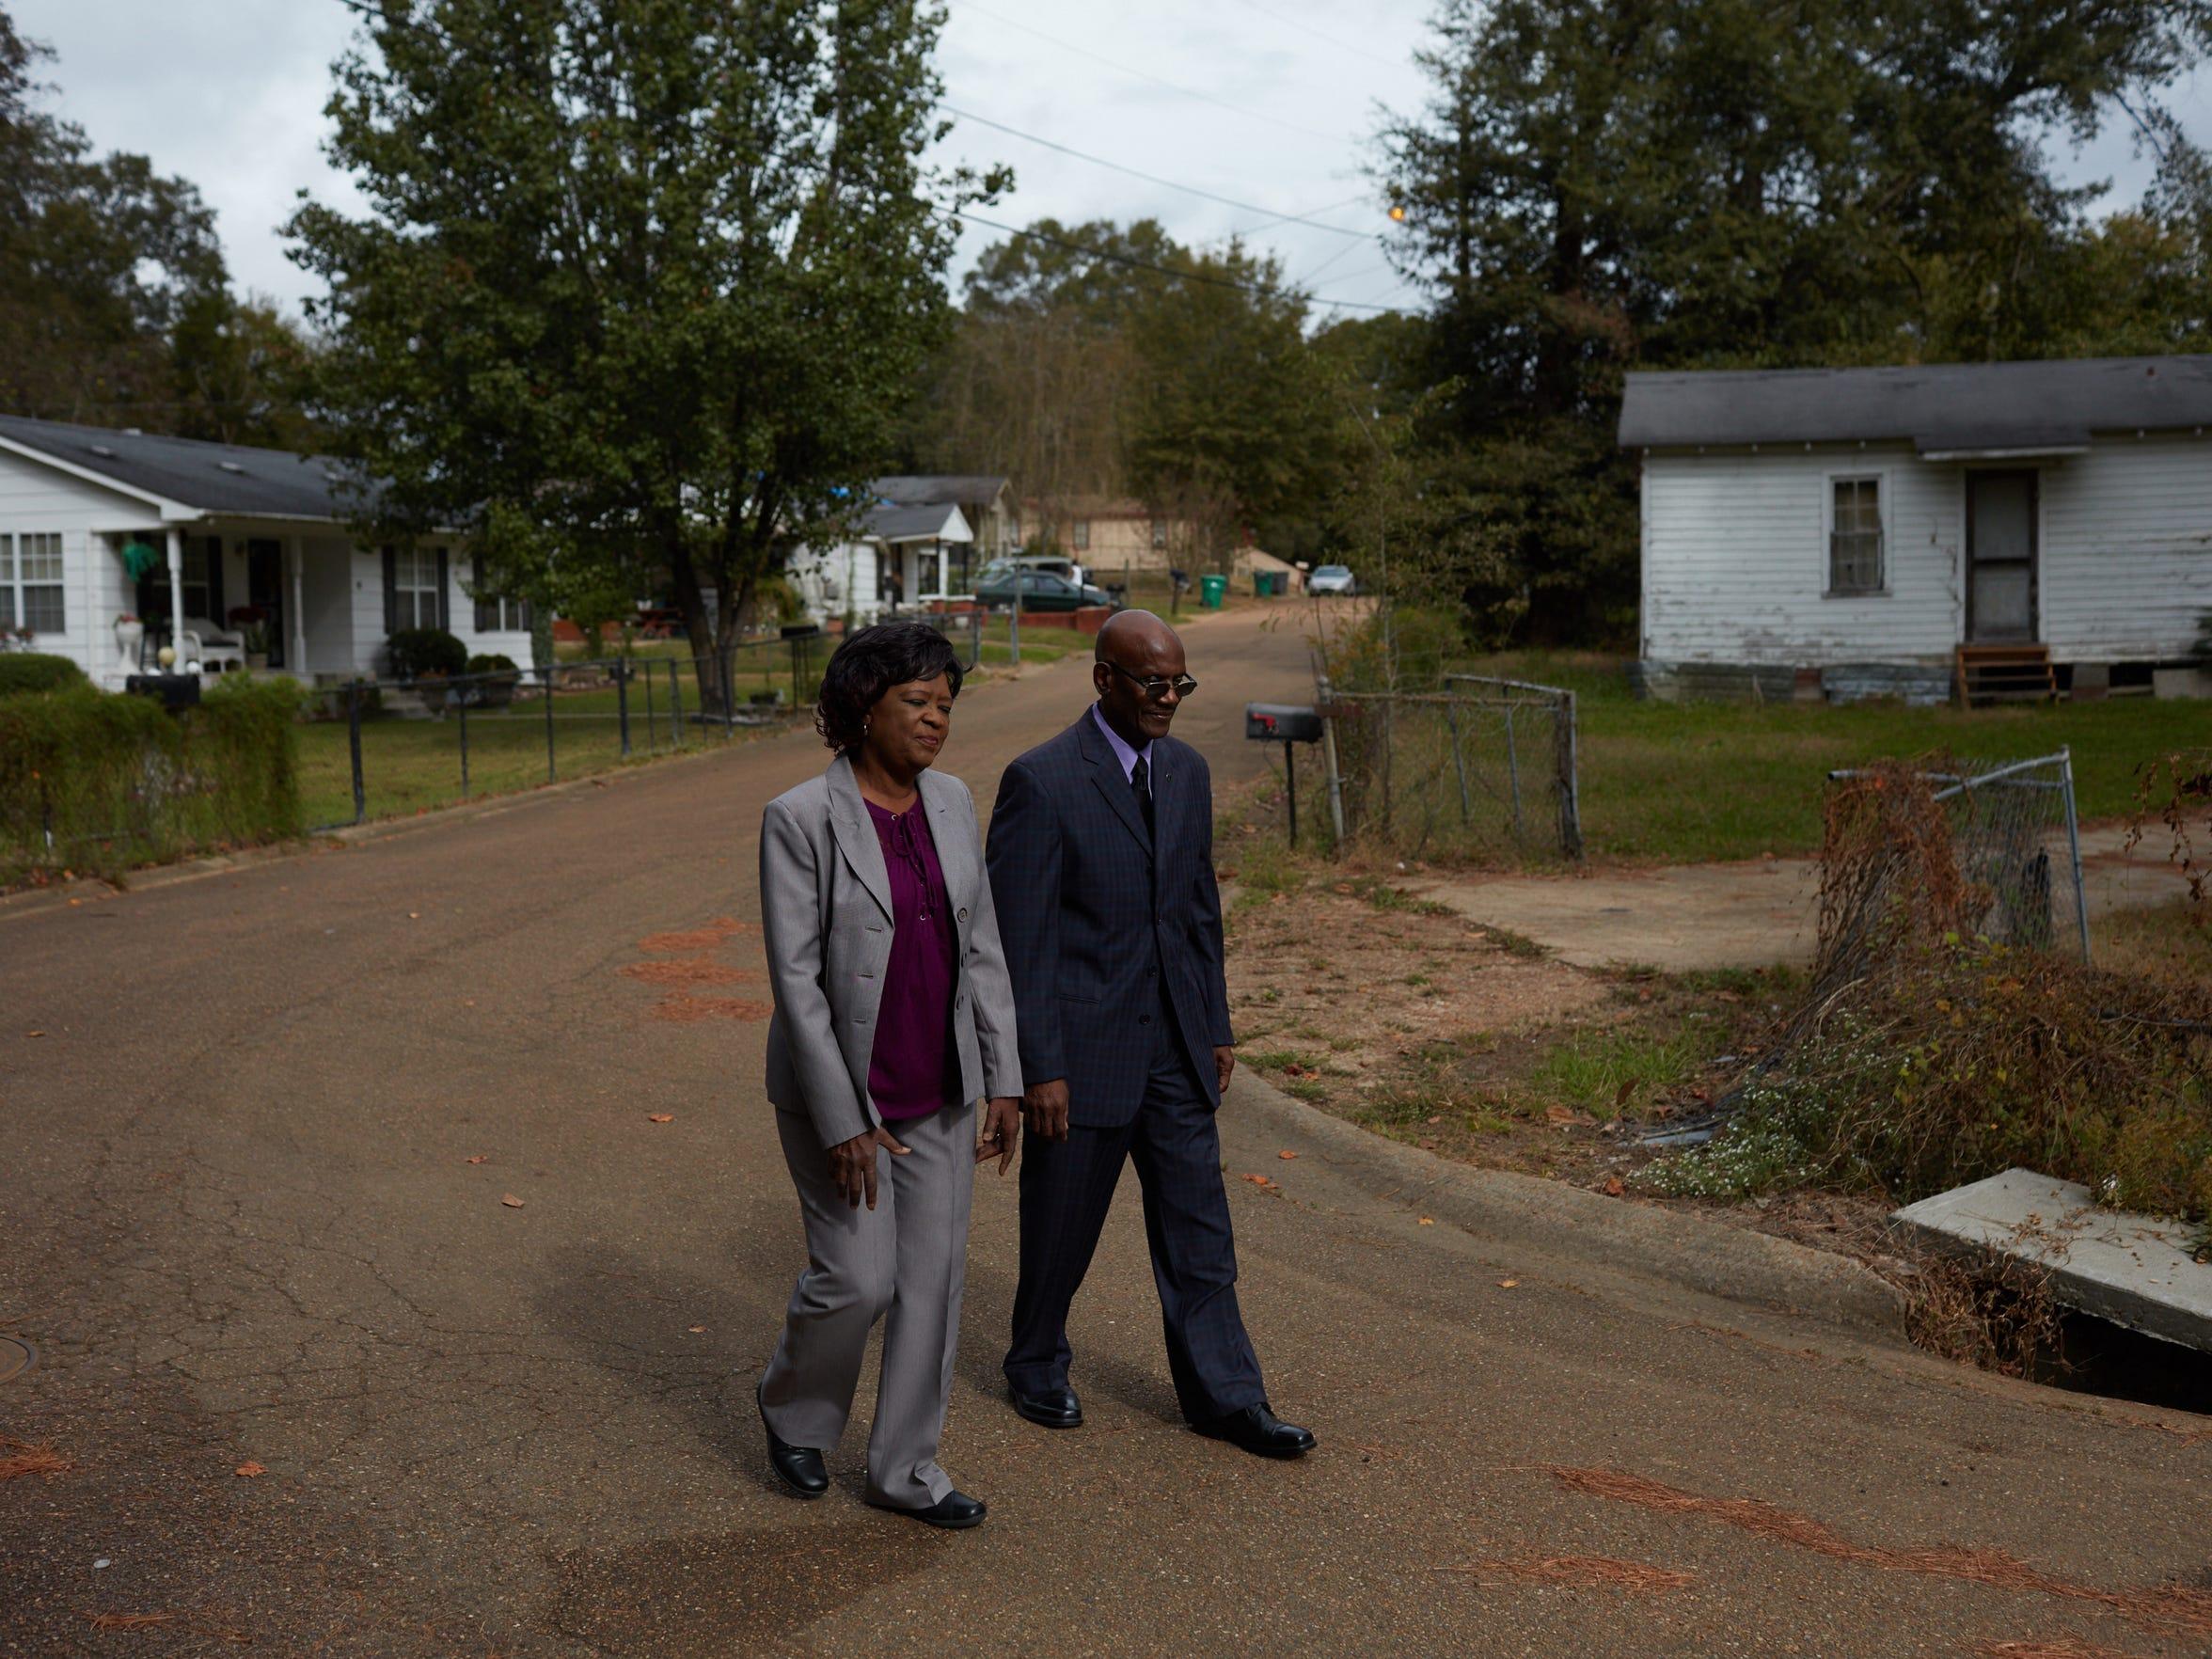 Lola and Archie Flowers walking in their Winona neighborhood